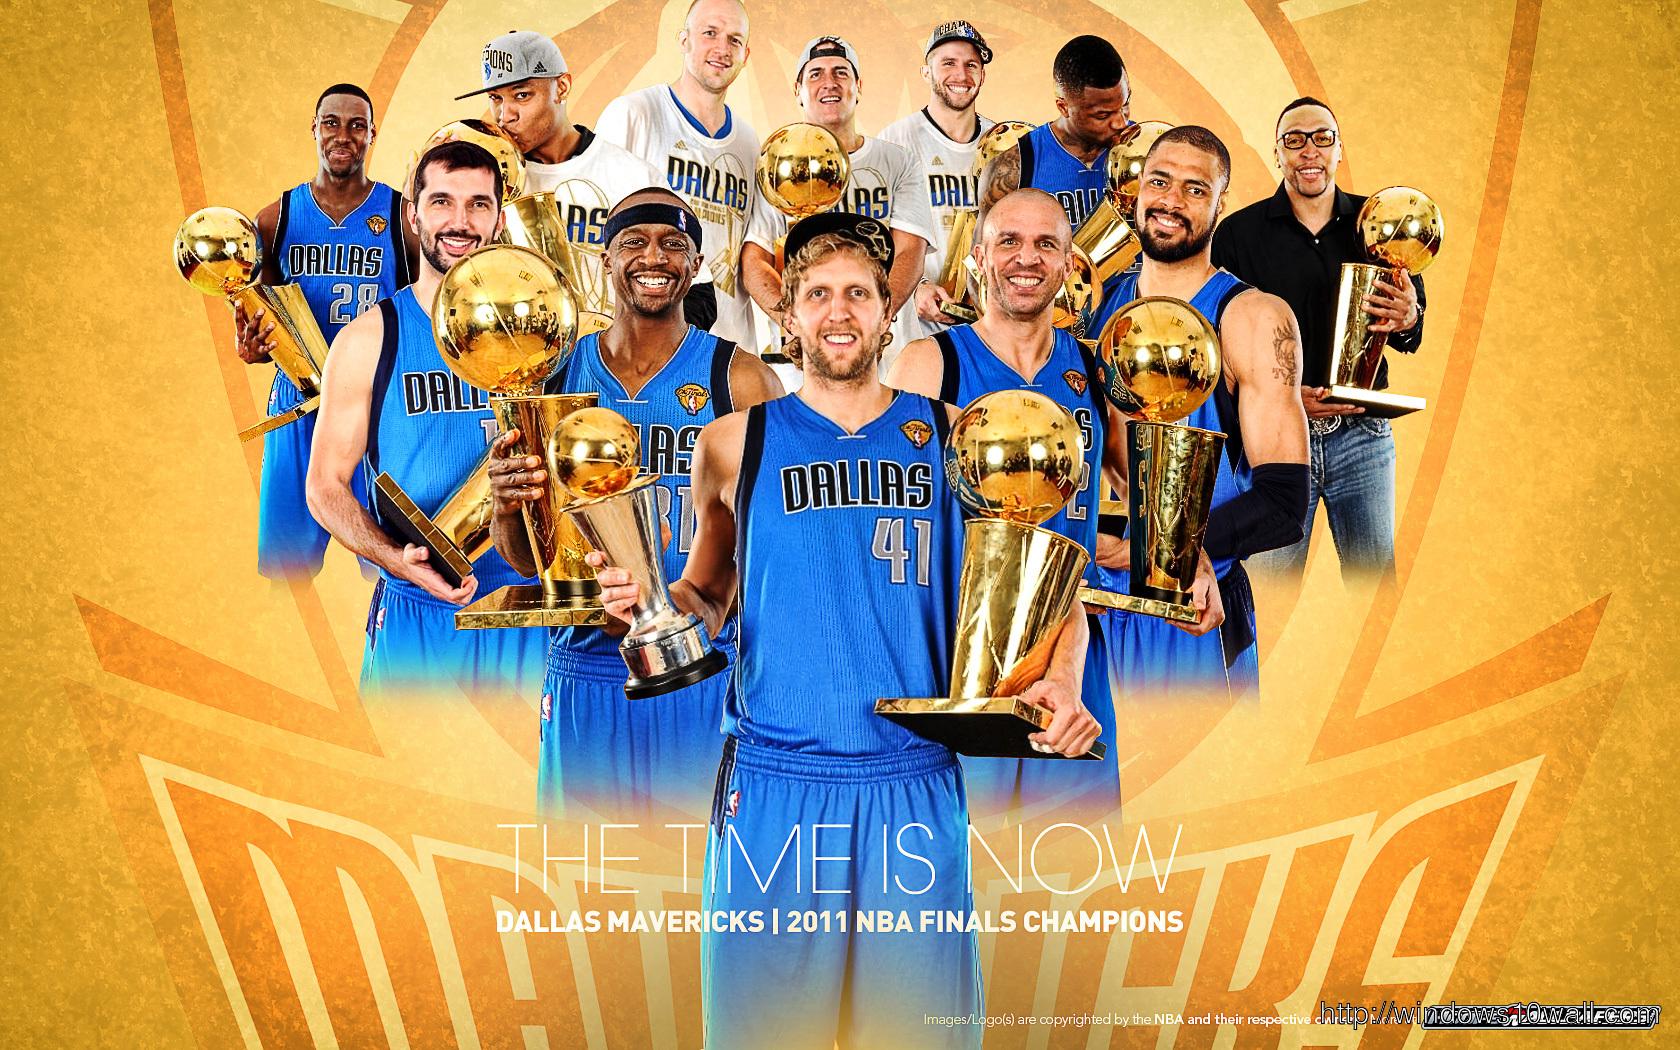 nba champions Mavericks wallpaper